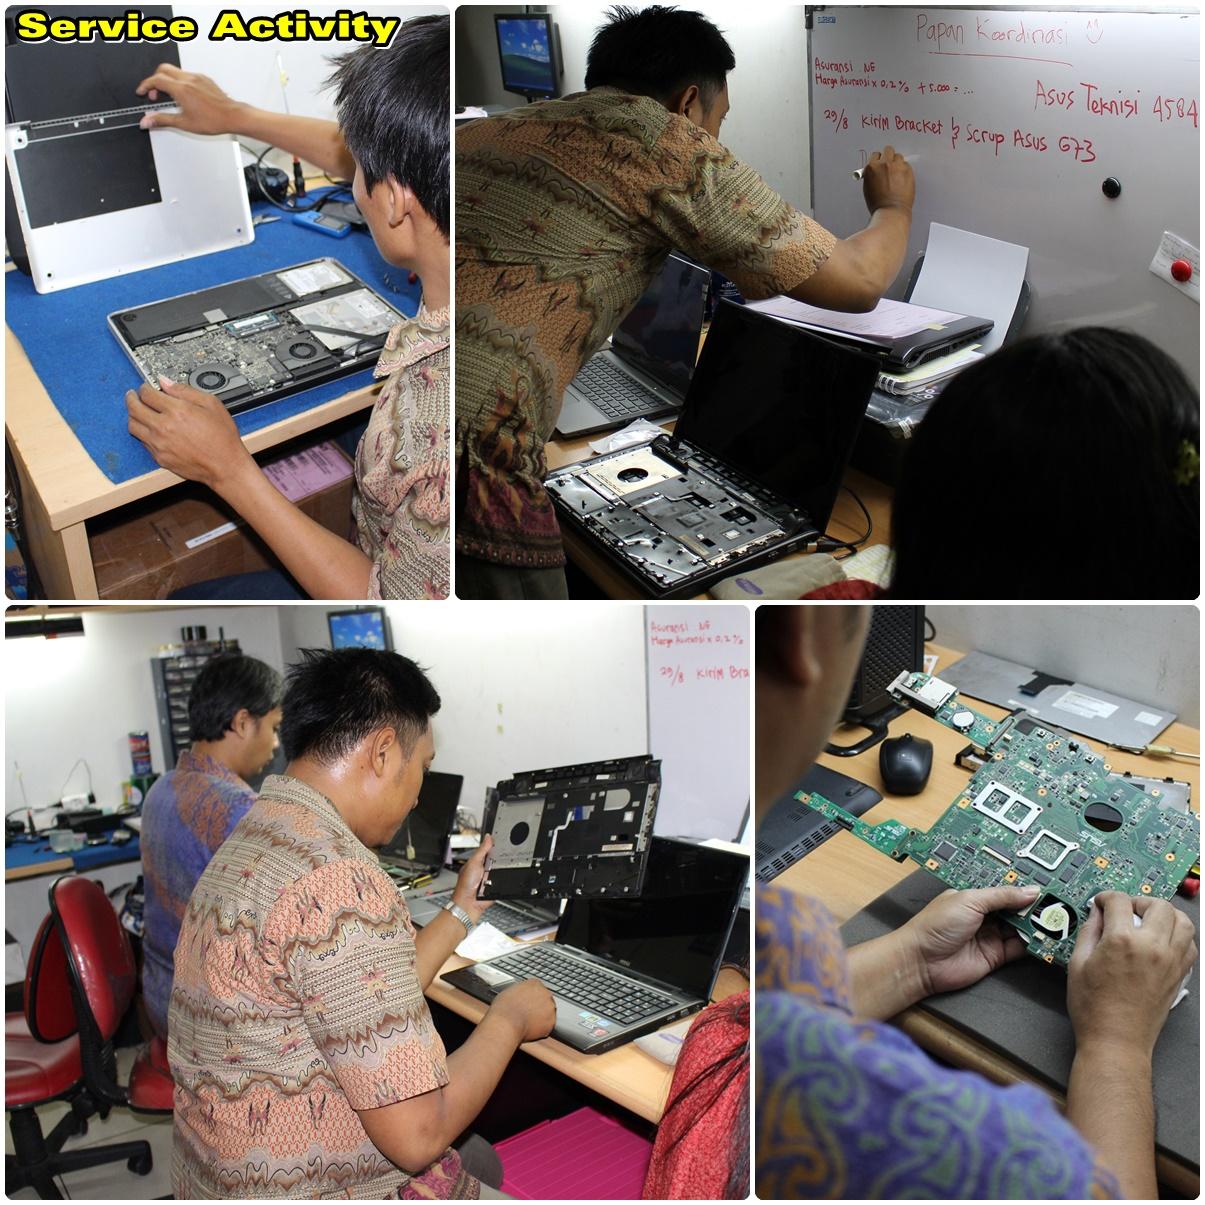 Service Activity